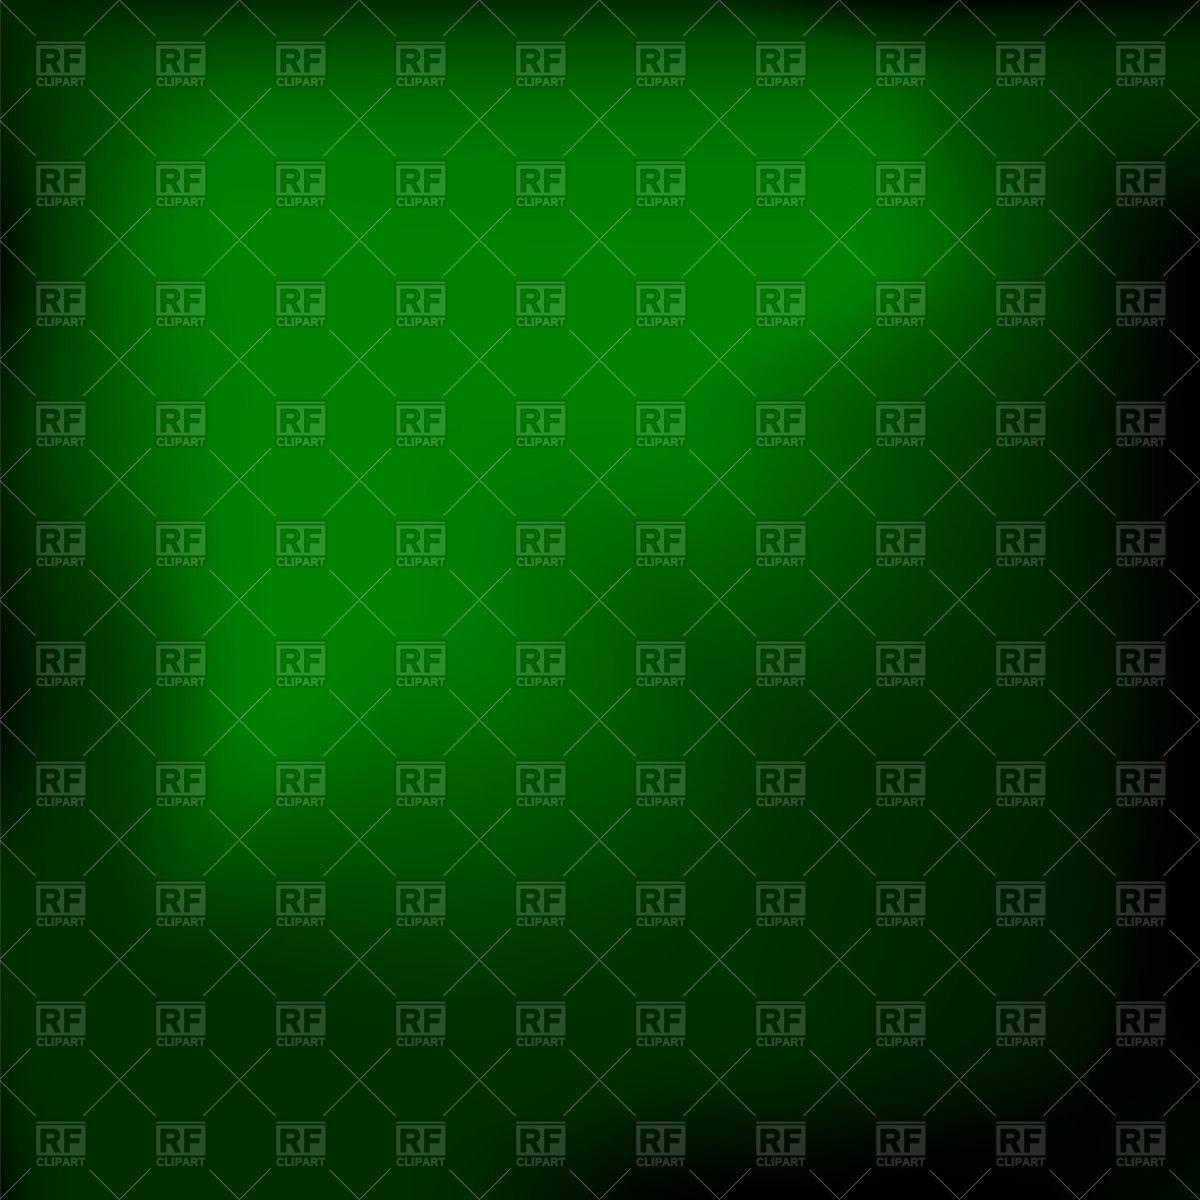 Dark green background Vector Image #71927.